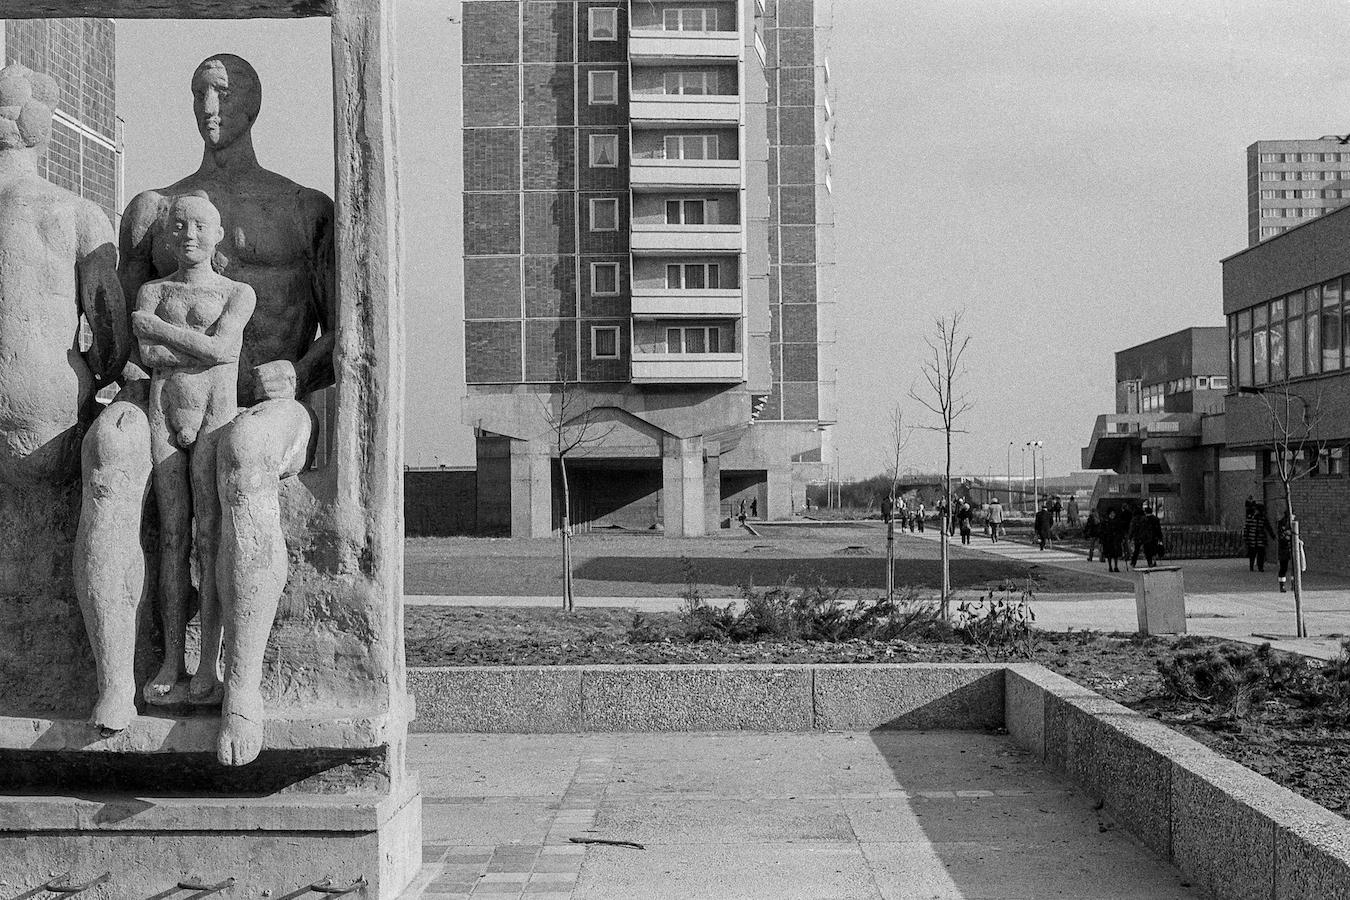 Ulrich Wüst, Rostock, 1982 © Ulrich Wüst